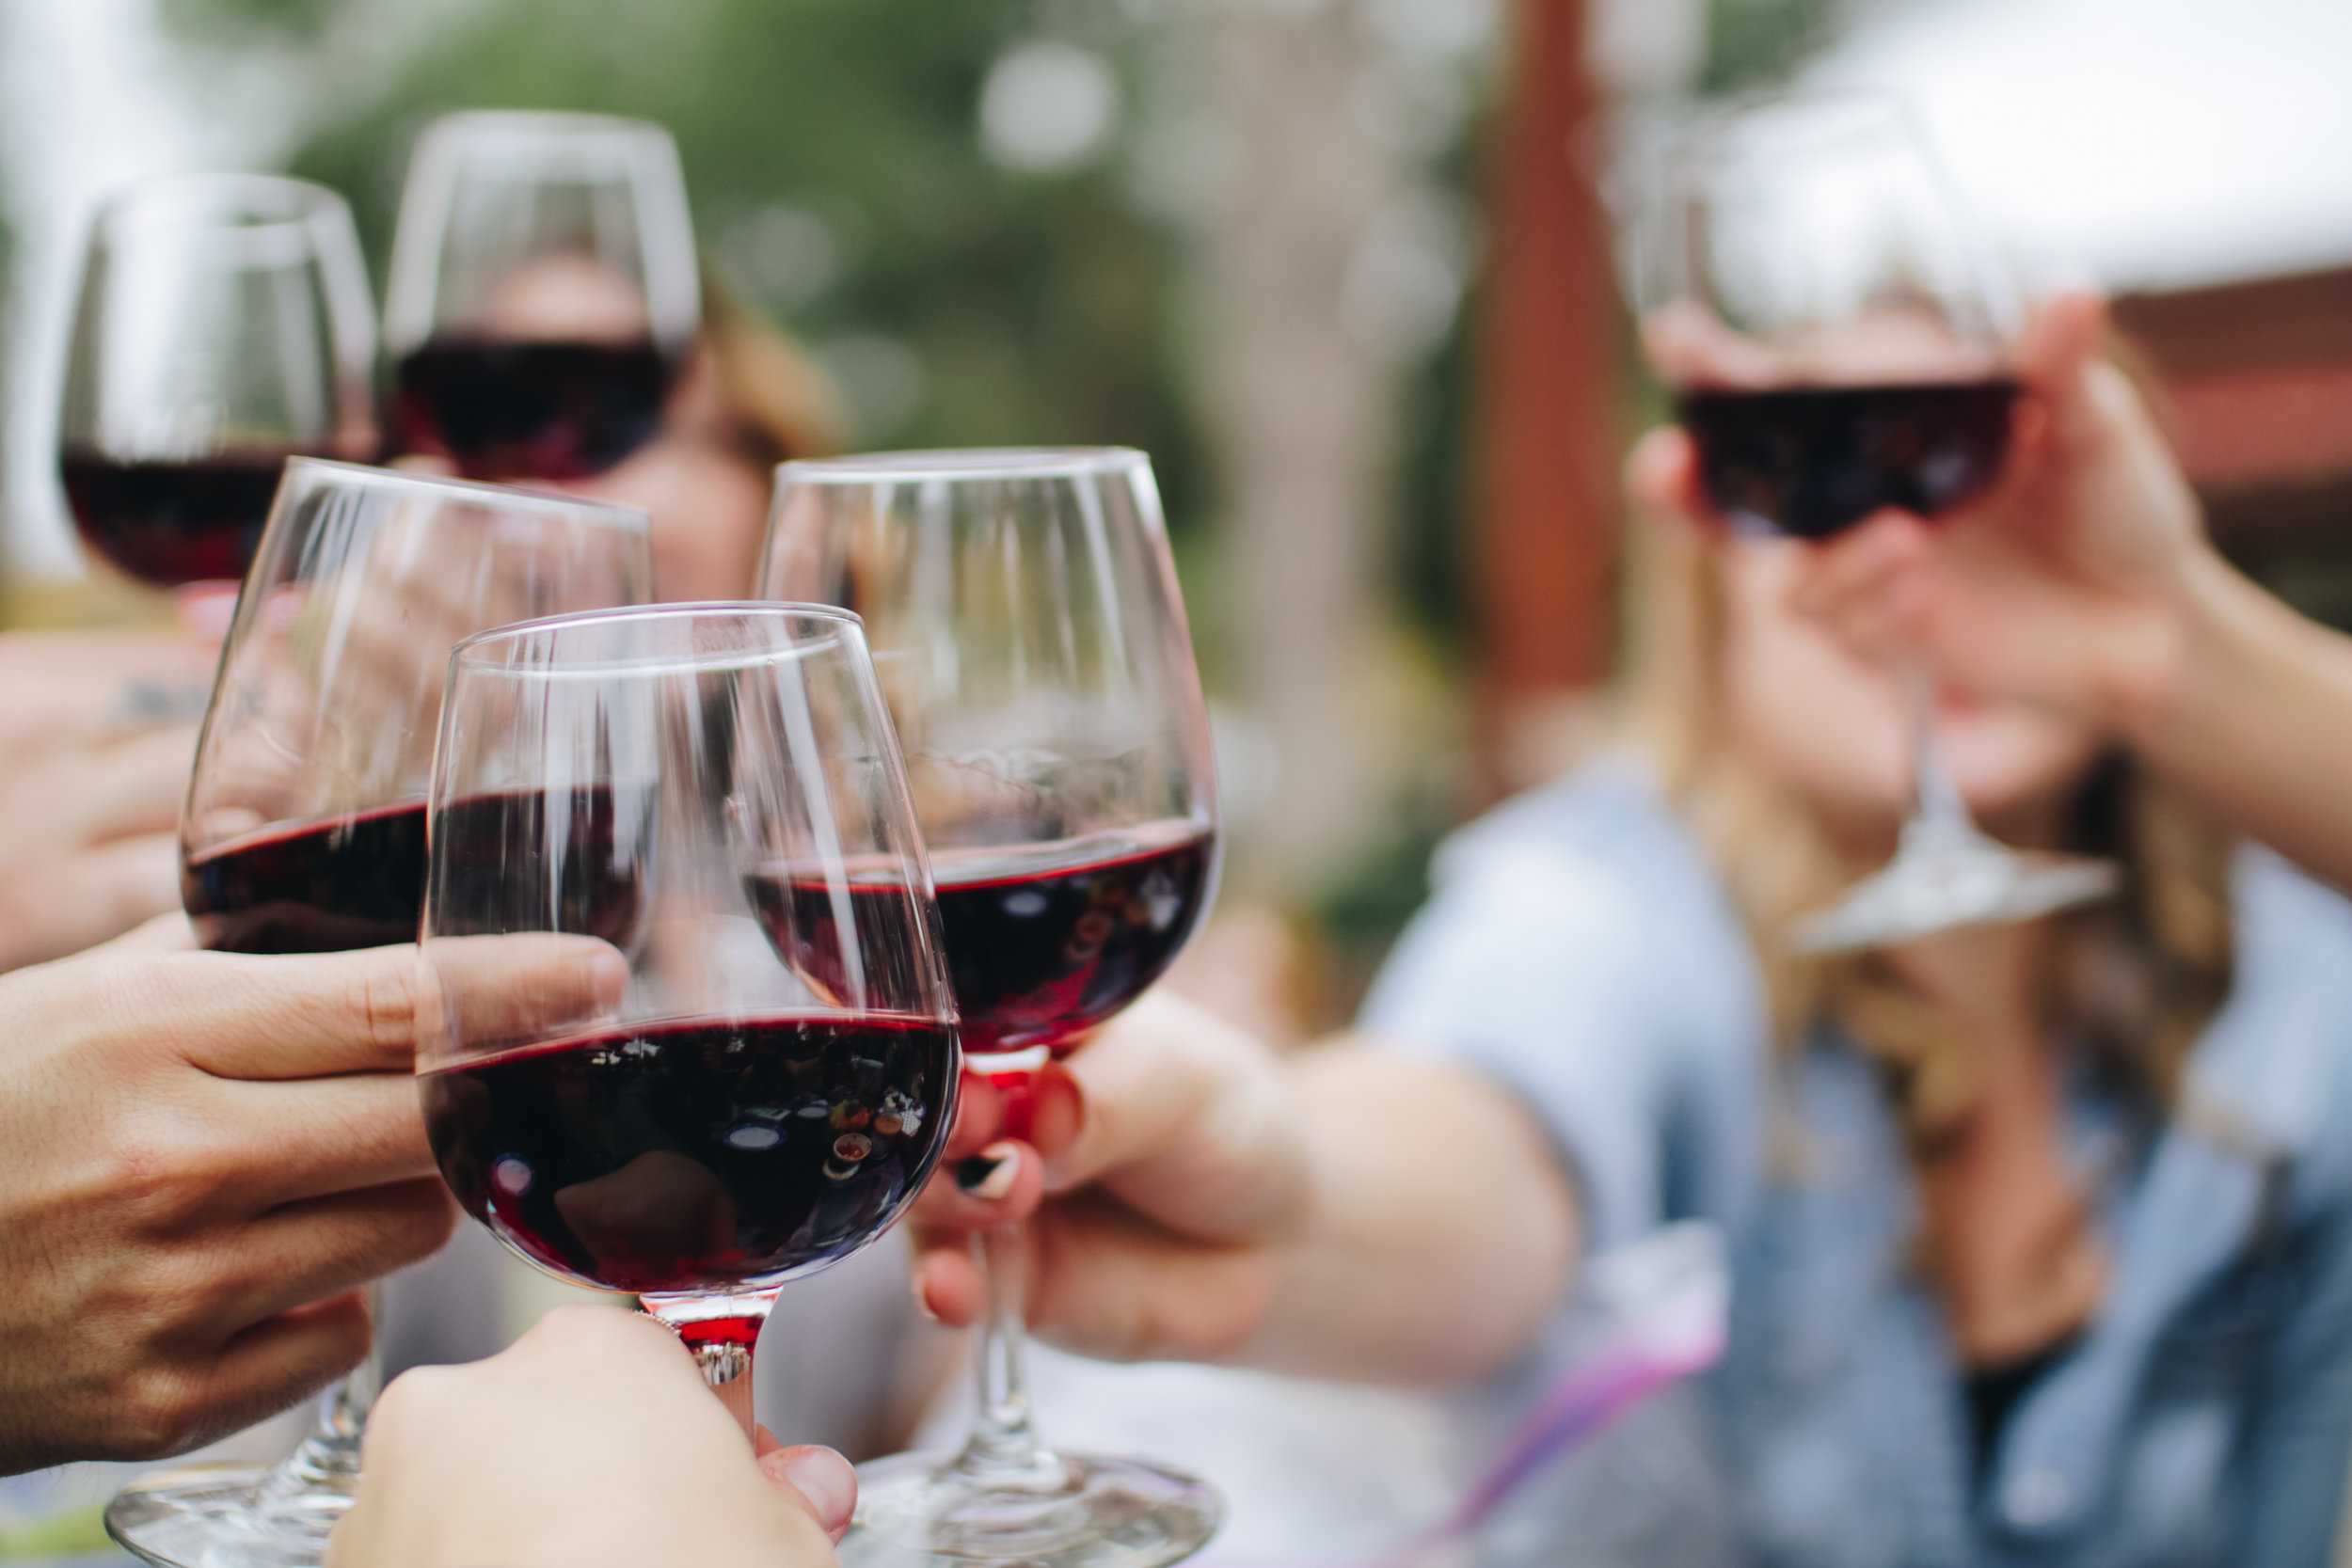 Wine Women & Shopping - Saturday, November 9th 2019